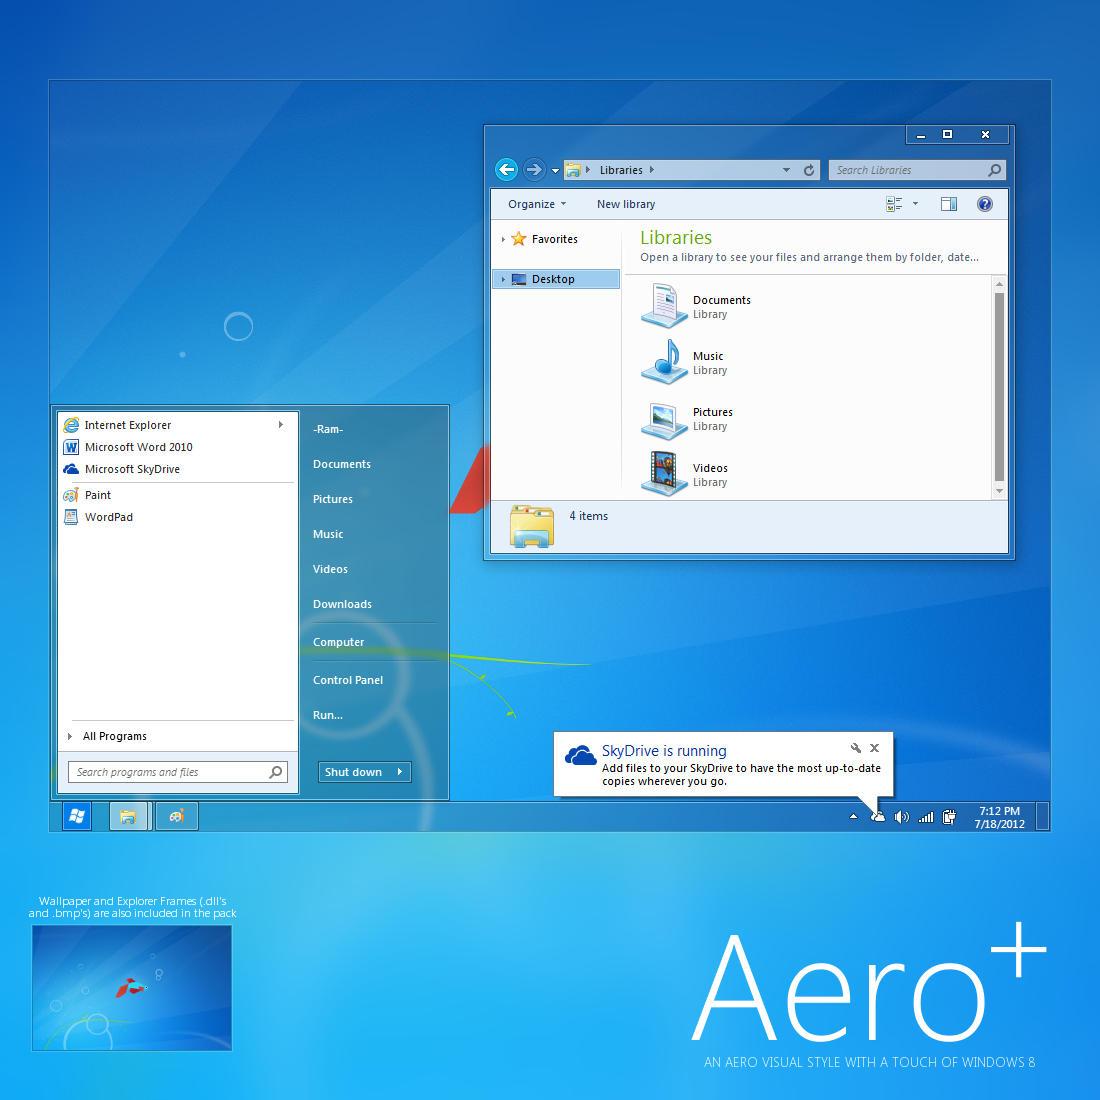 aero__by_giro54-d51m001.jpg